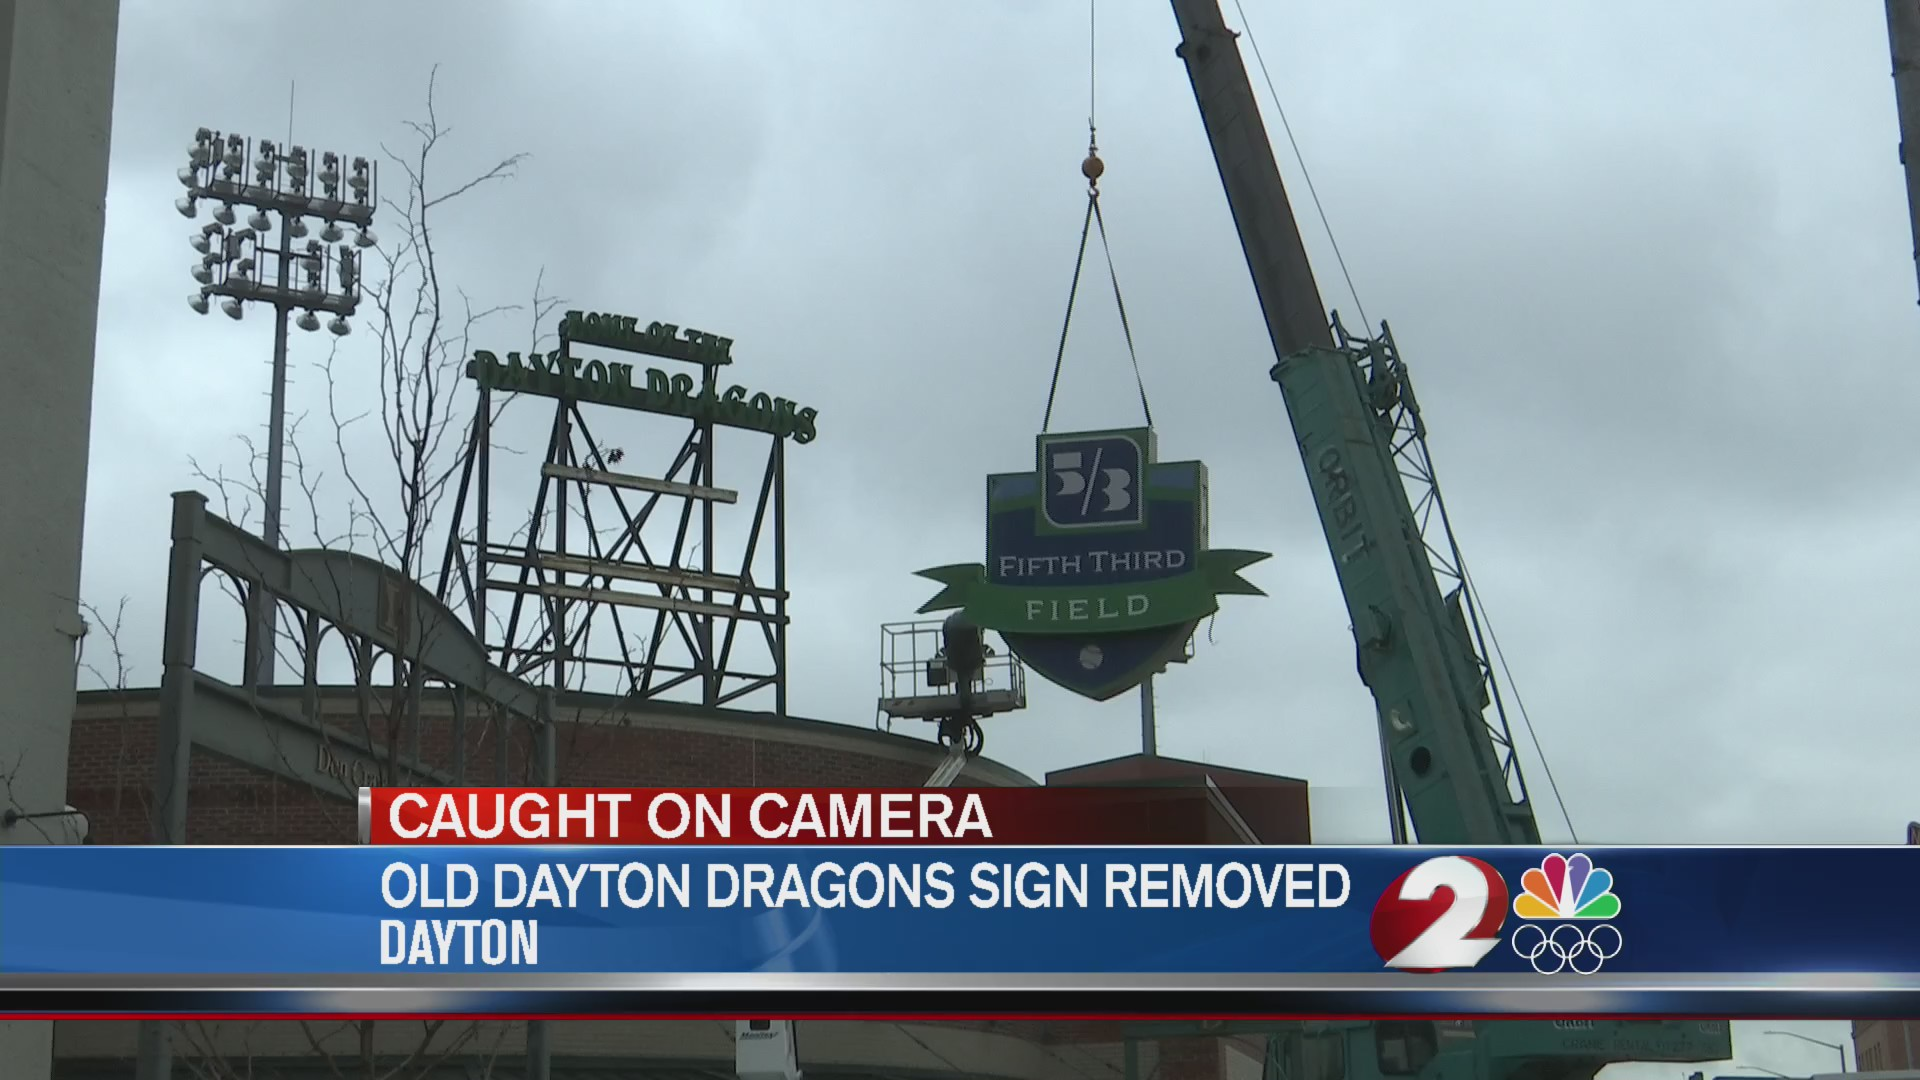 Old Dayton Dragons sign removed